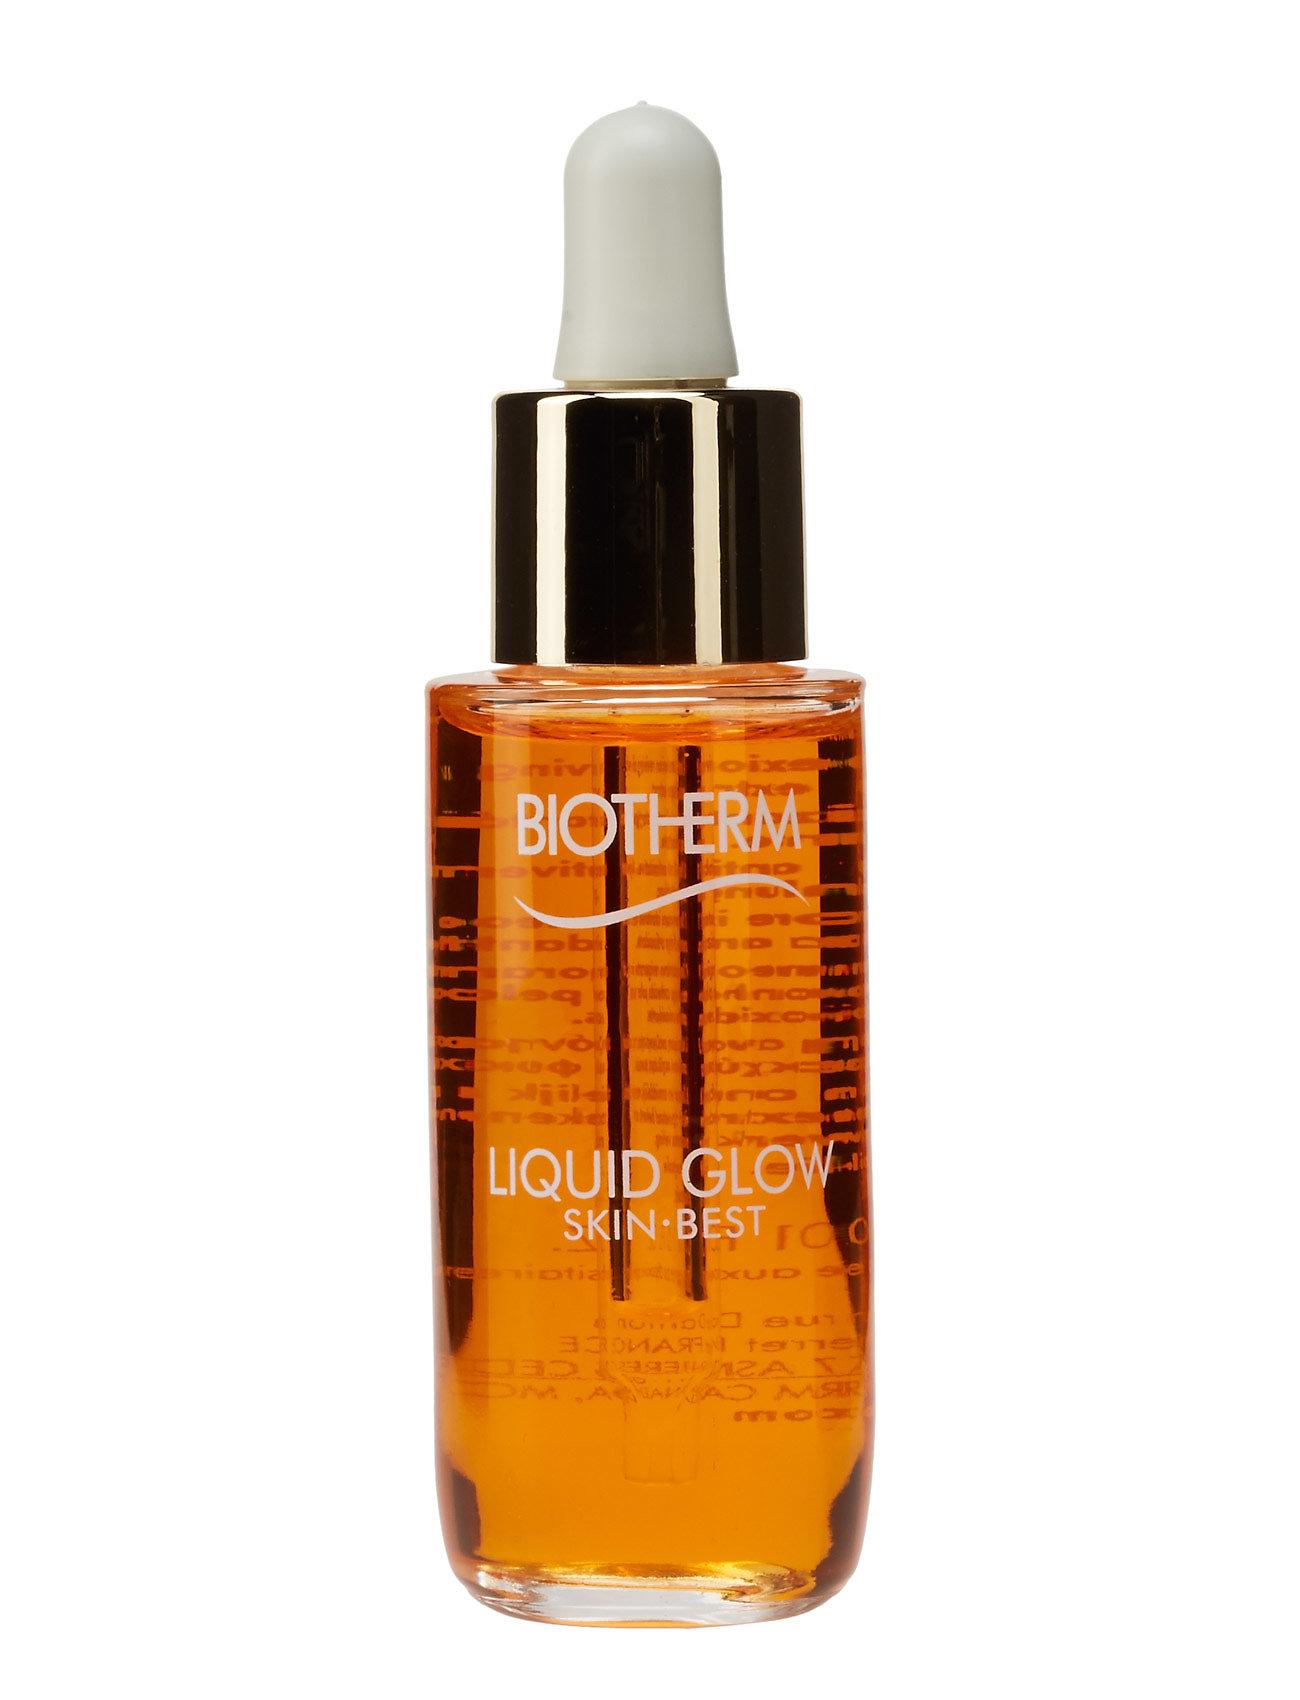 biotherm Skin best liquid glow 30 ml. fra boozt.com dk